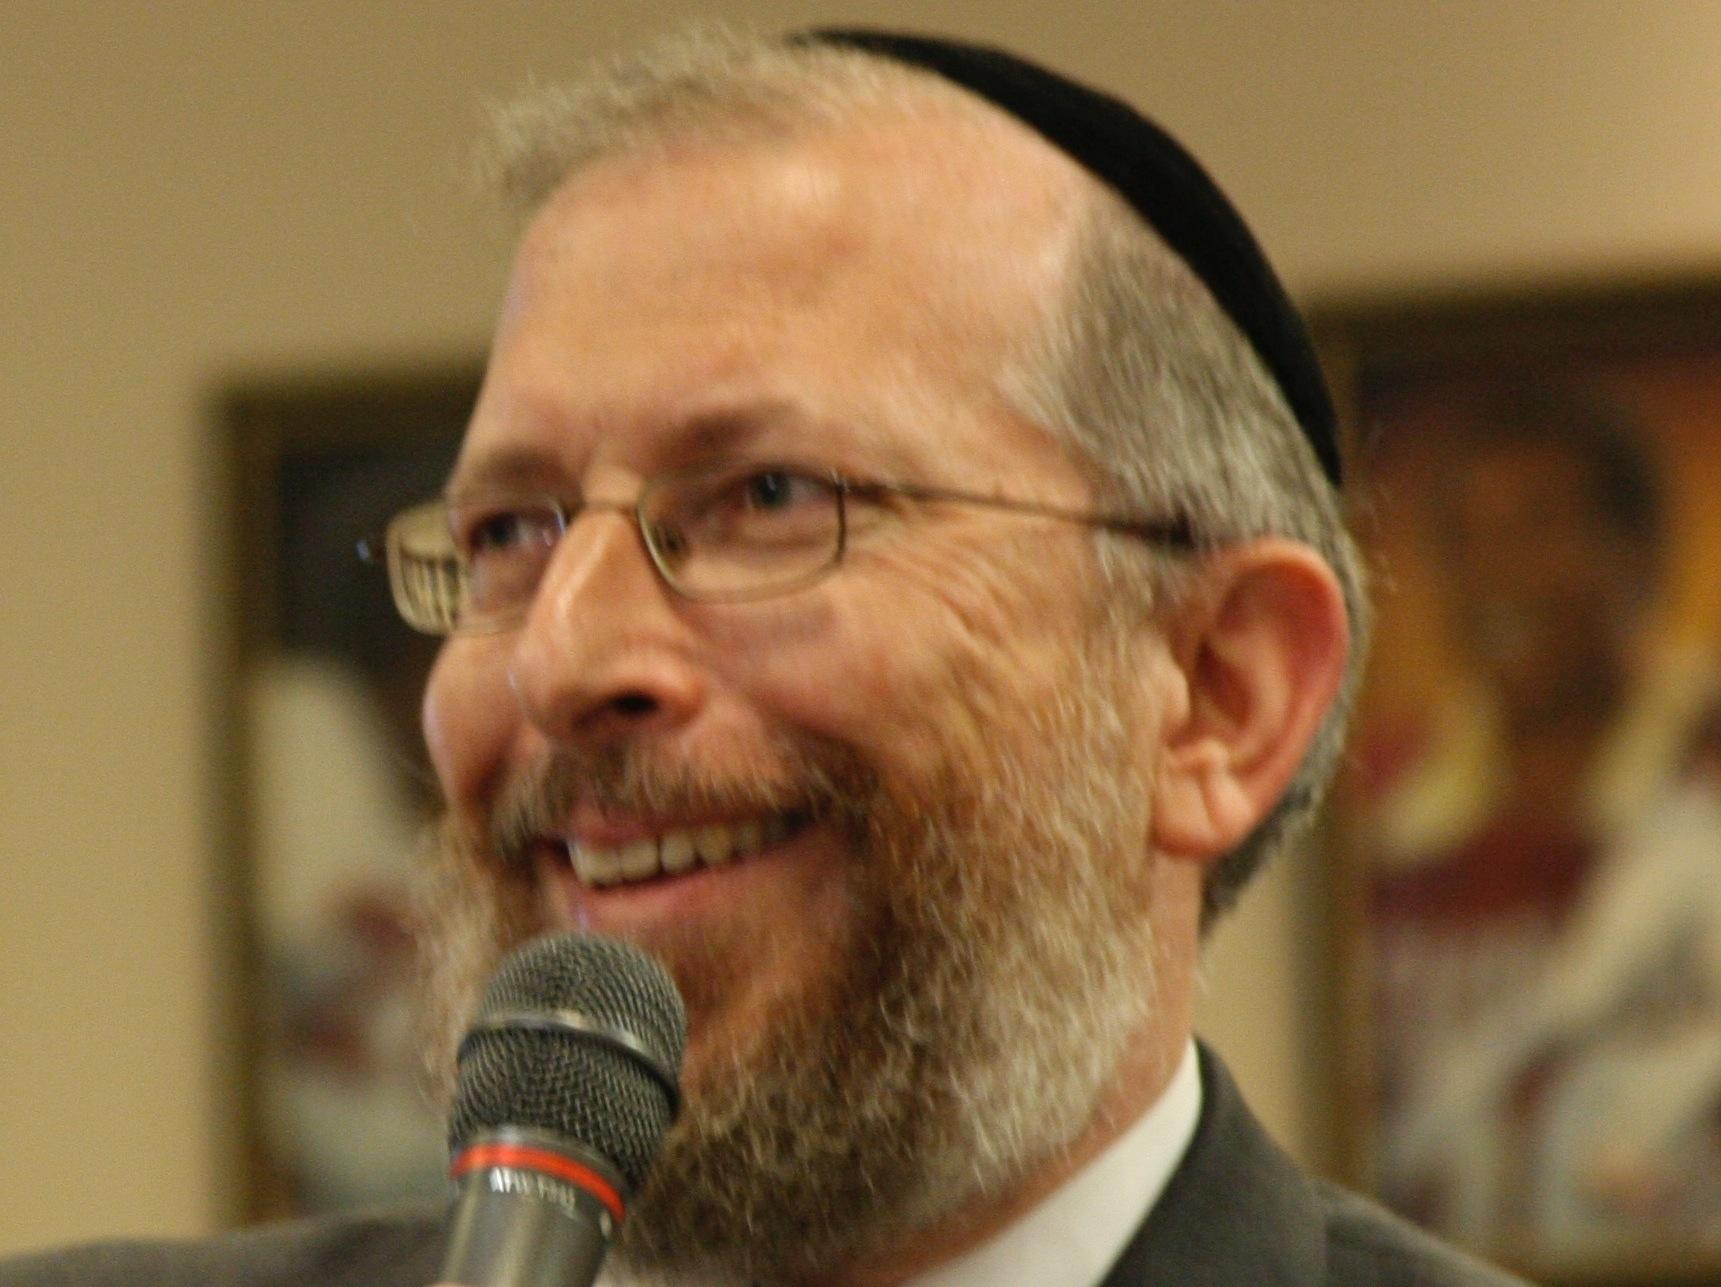 Rabbi Elimelech Goldberg